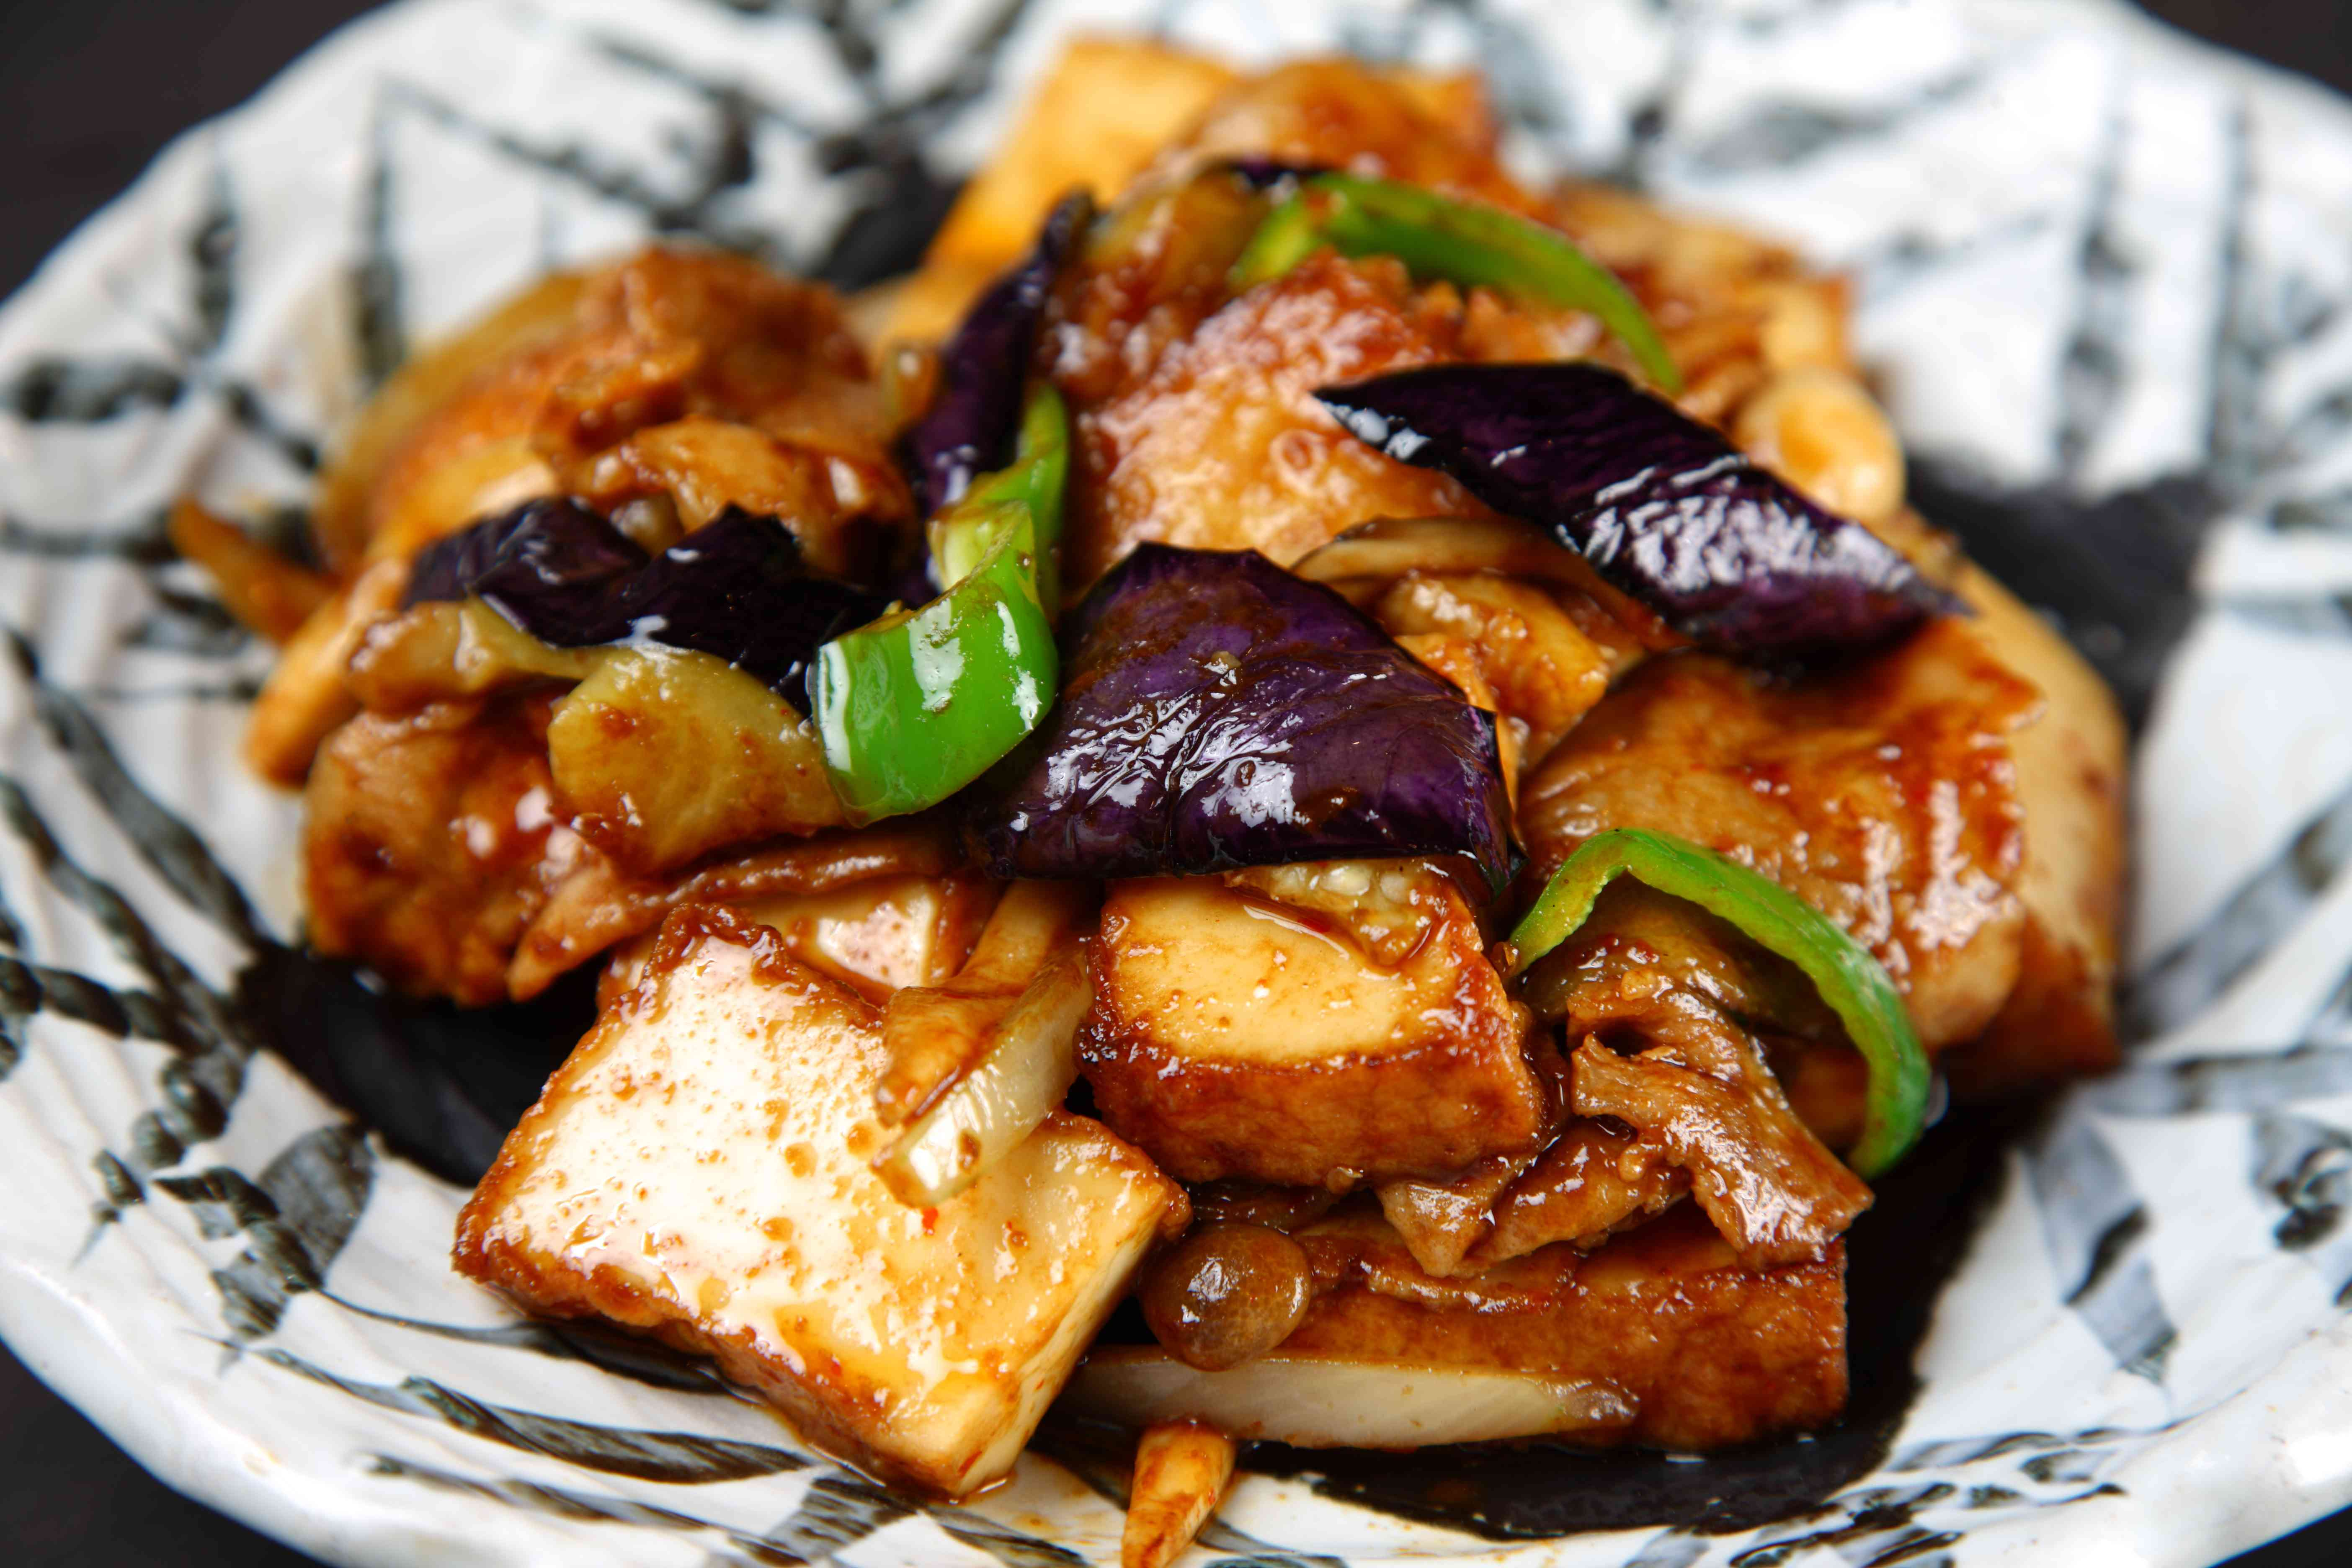 Thick fried tofu and eggplant miso Seasoned stir-fry